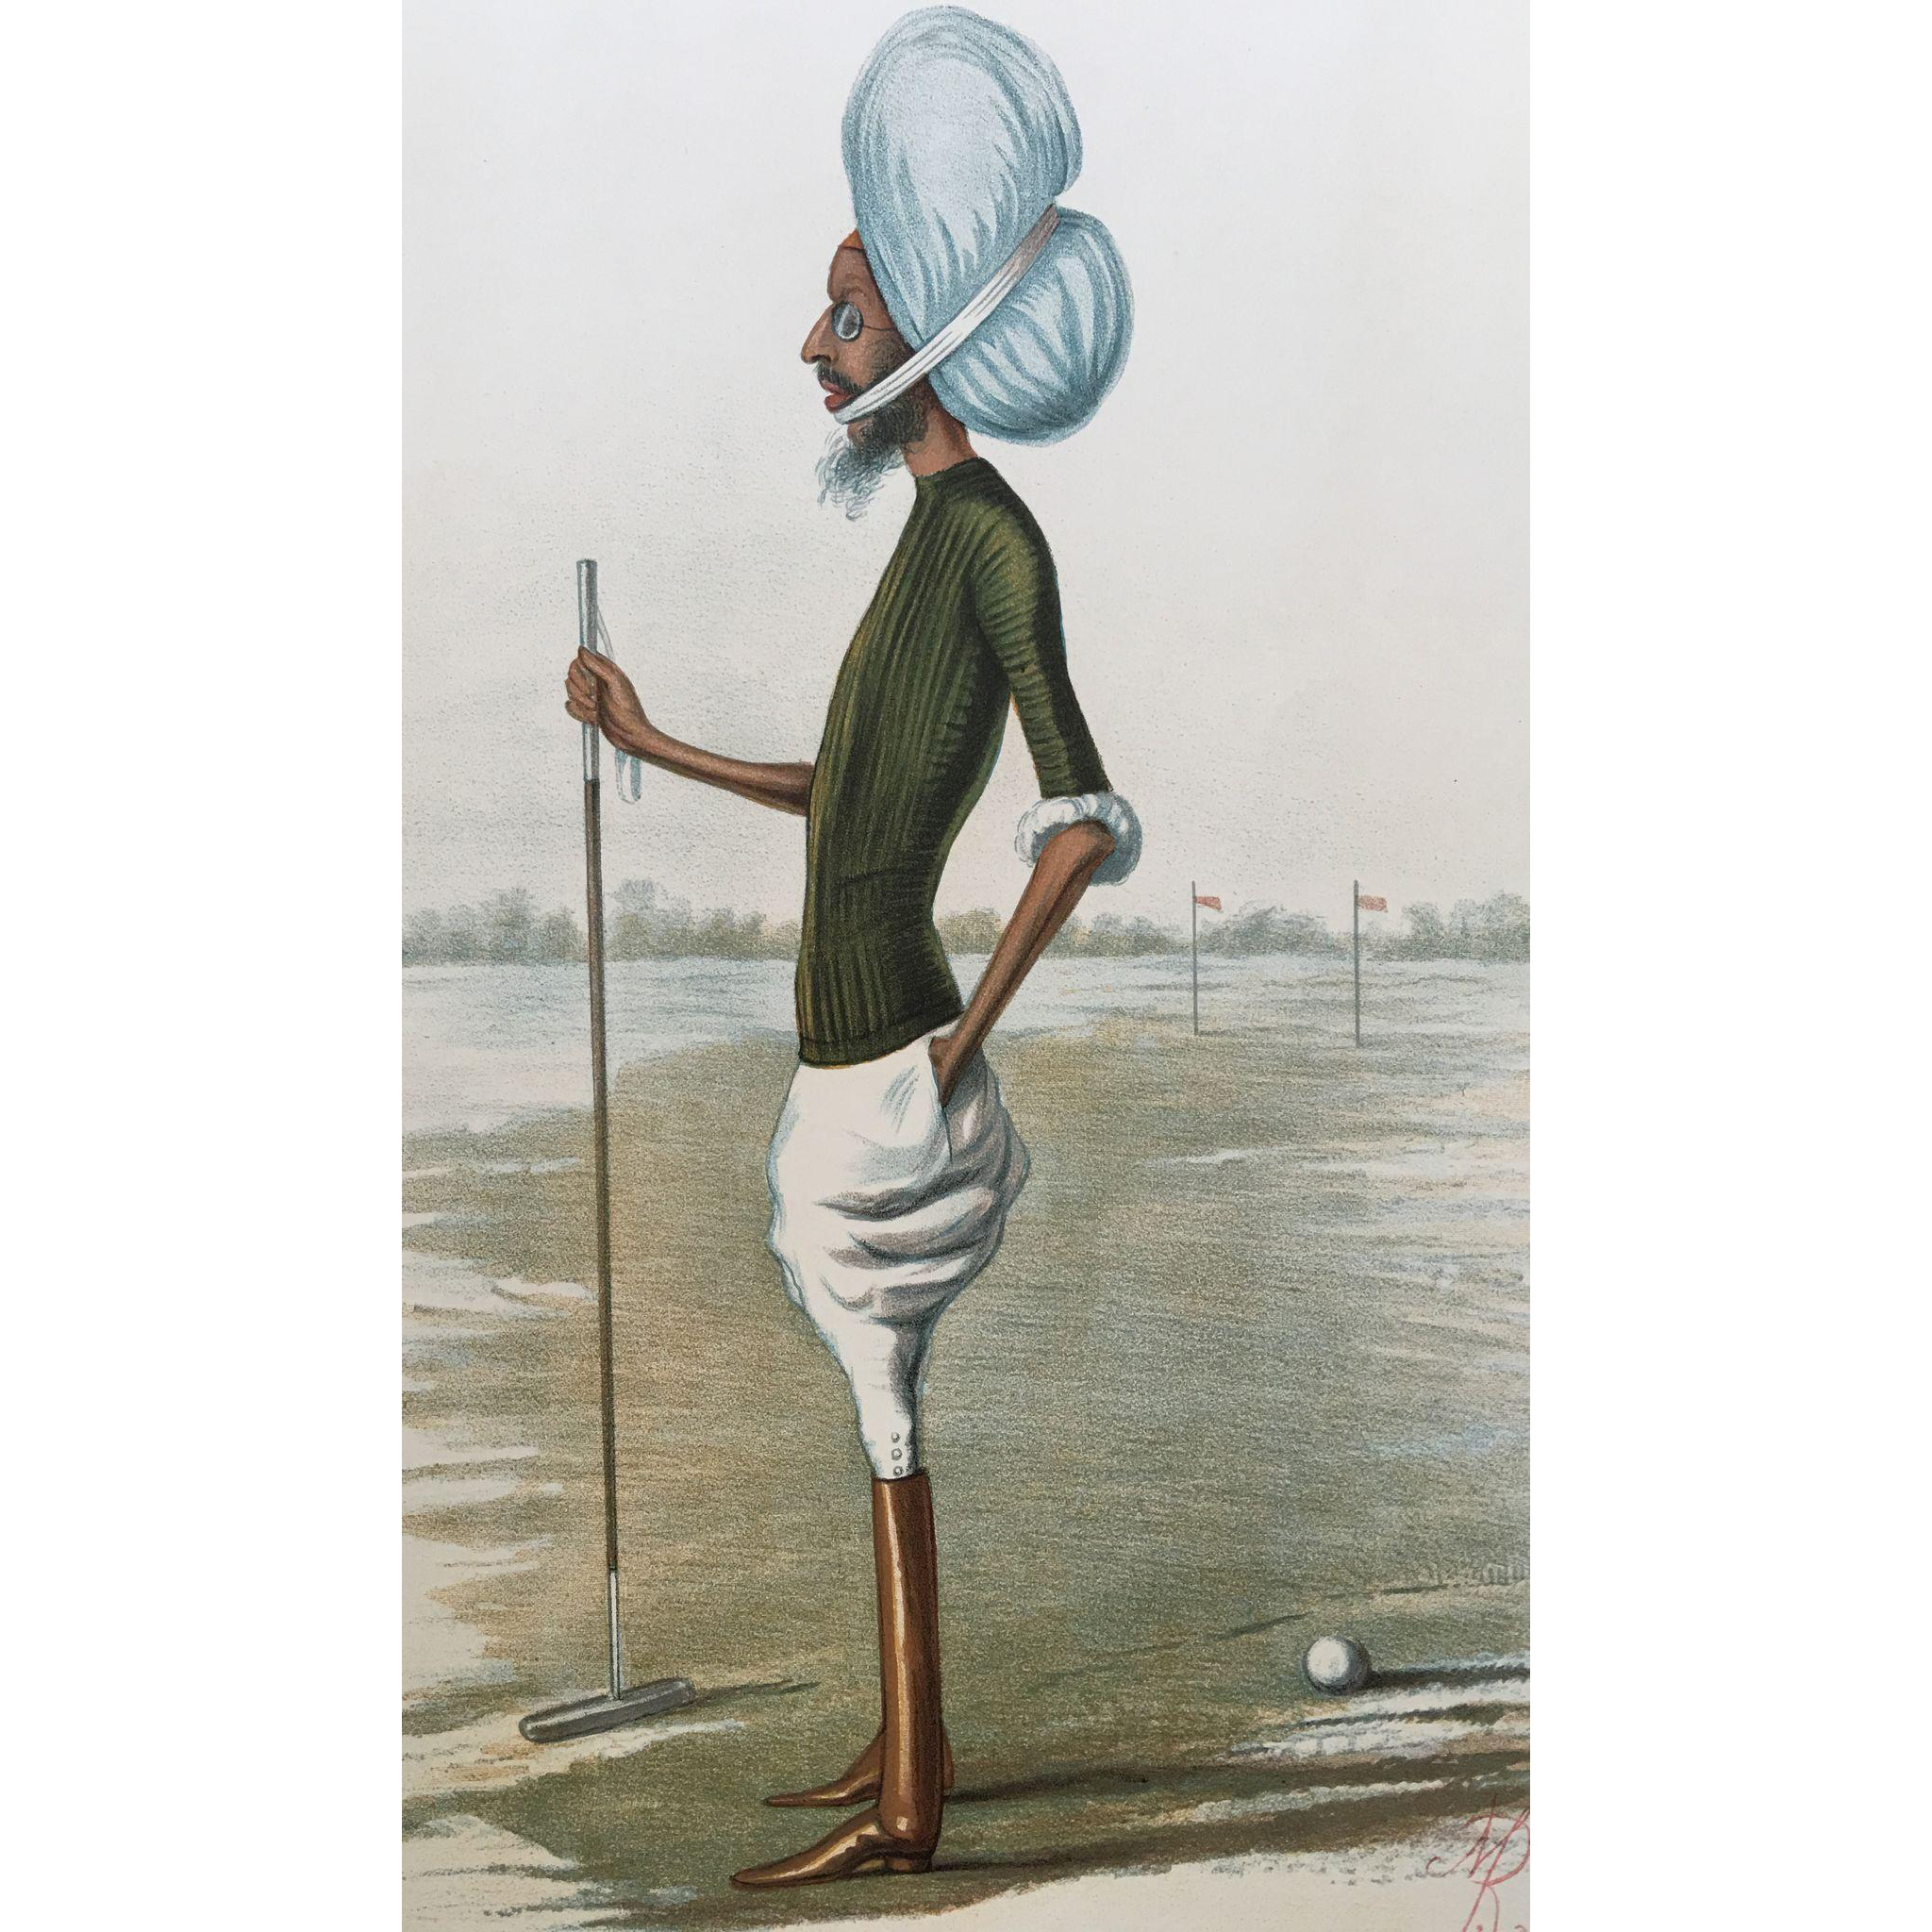 Antique Original Vanity Fair Polo Print - The Maharajah of Patiala